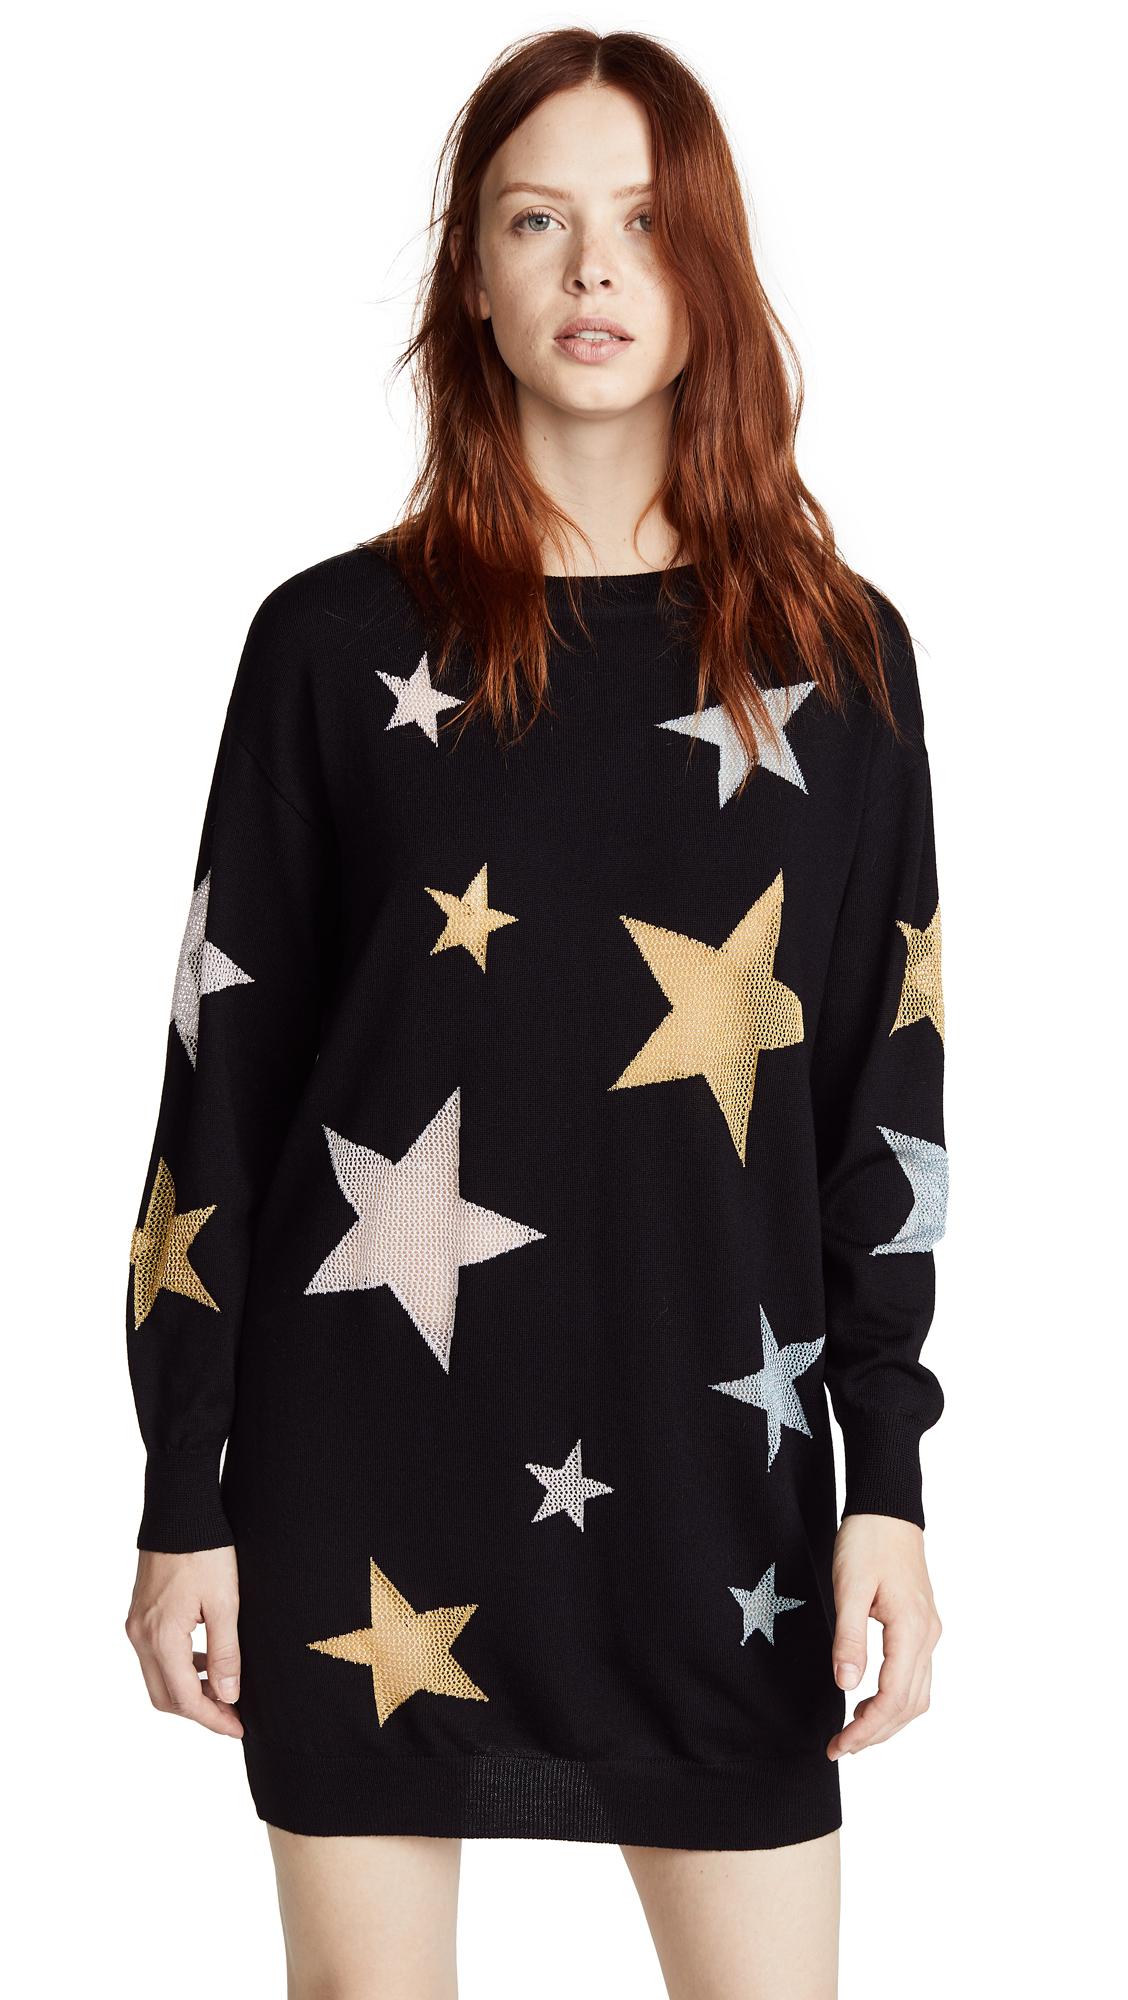 Boutique Moschino Star Mini Dress